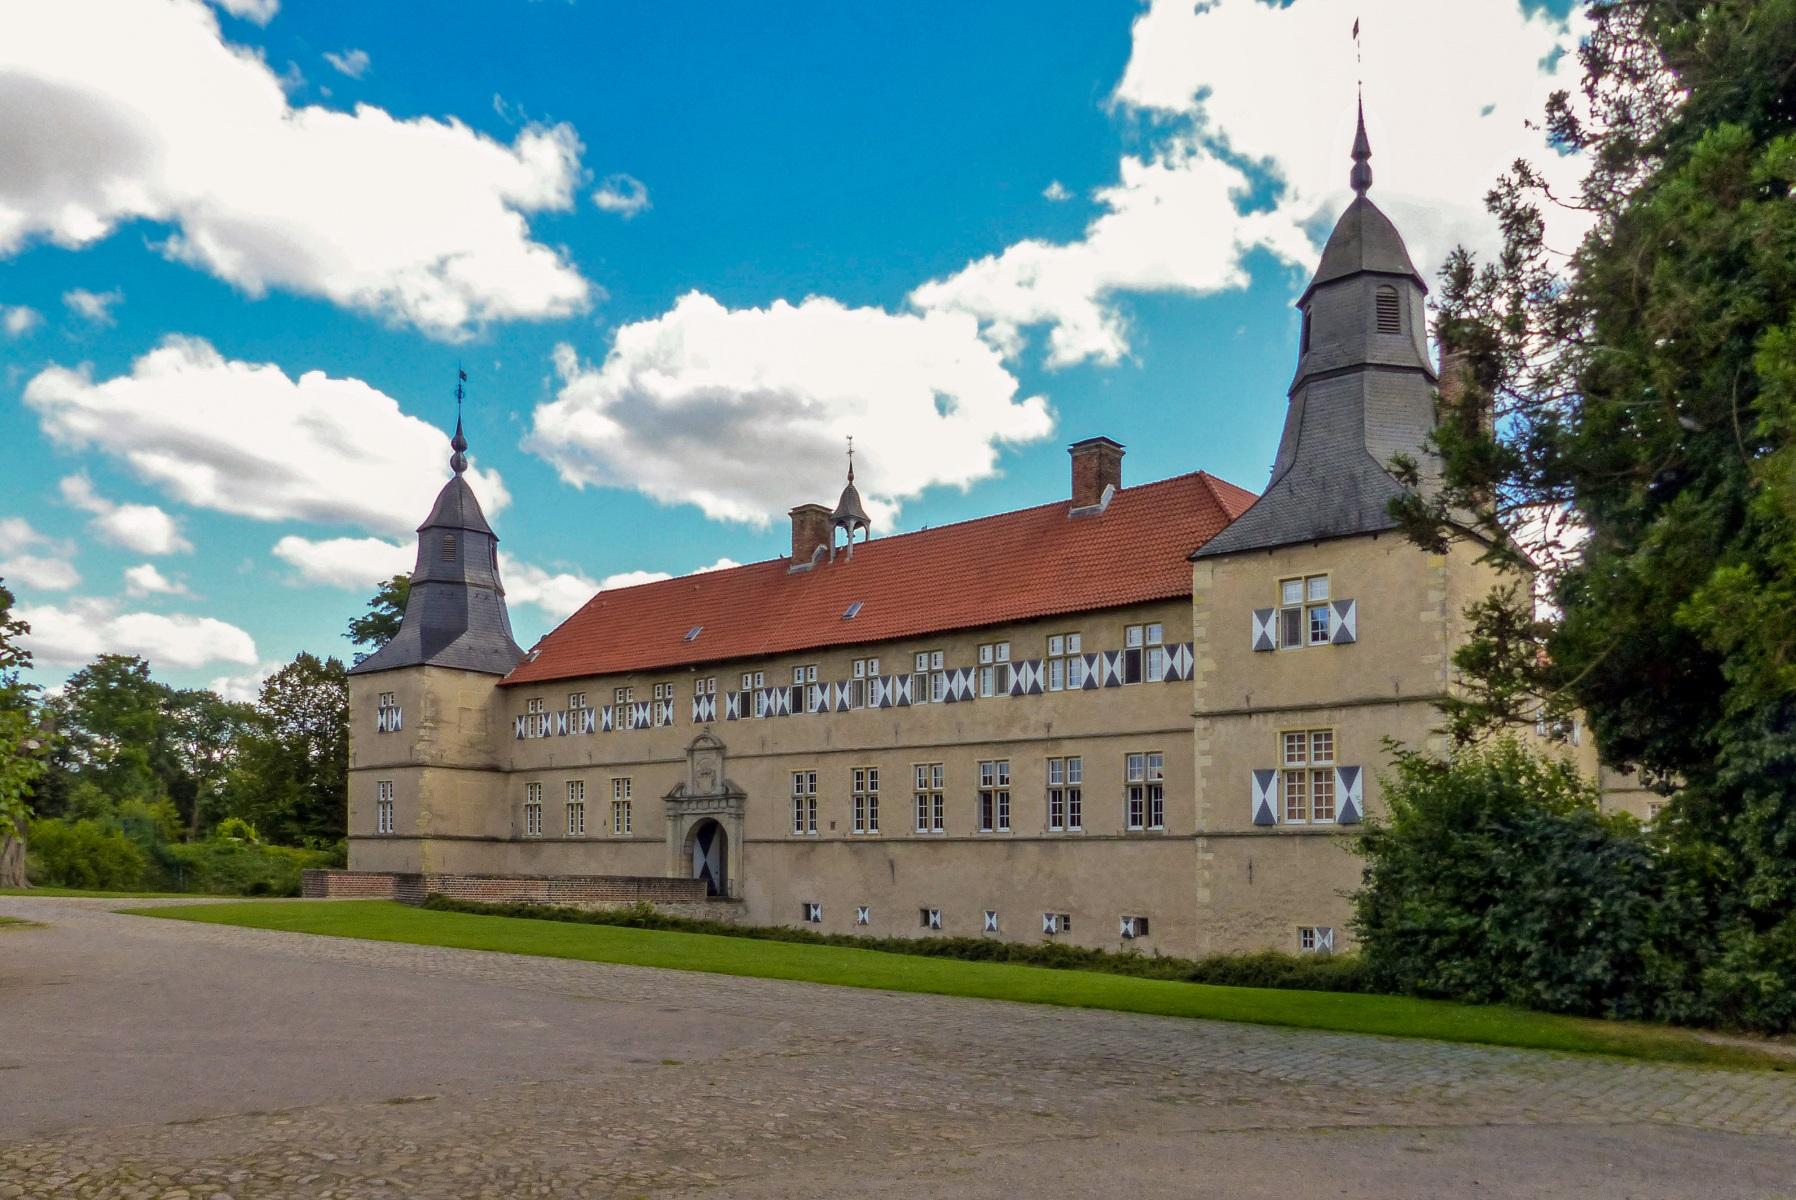 Schloss Westerwinkel   Hauptschloss vom Innenhof